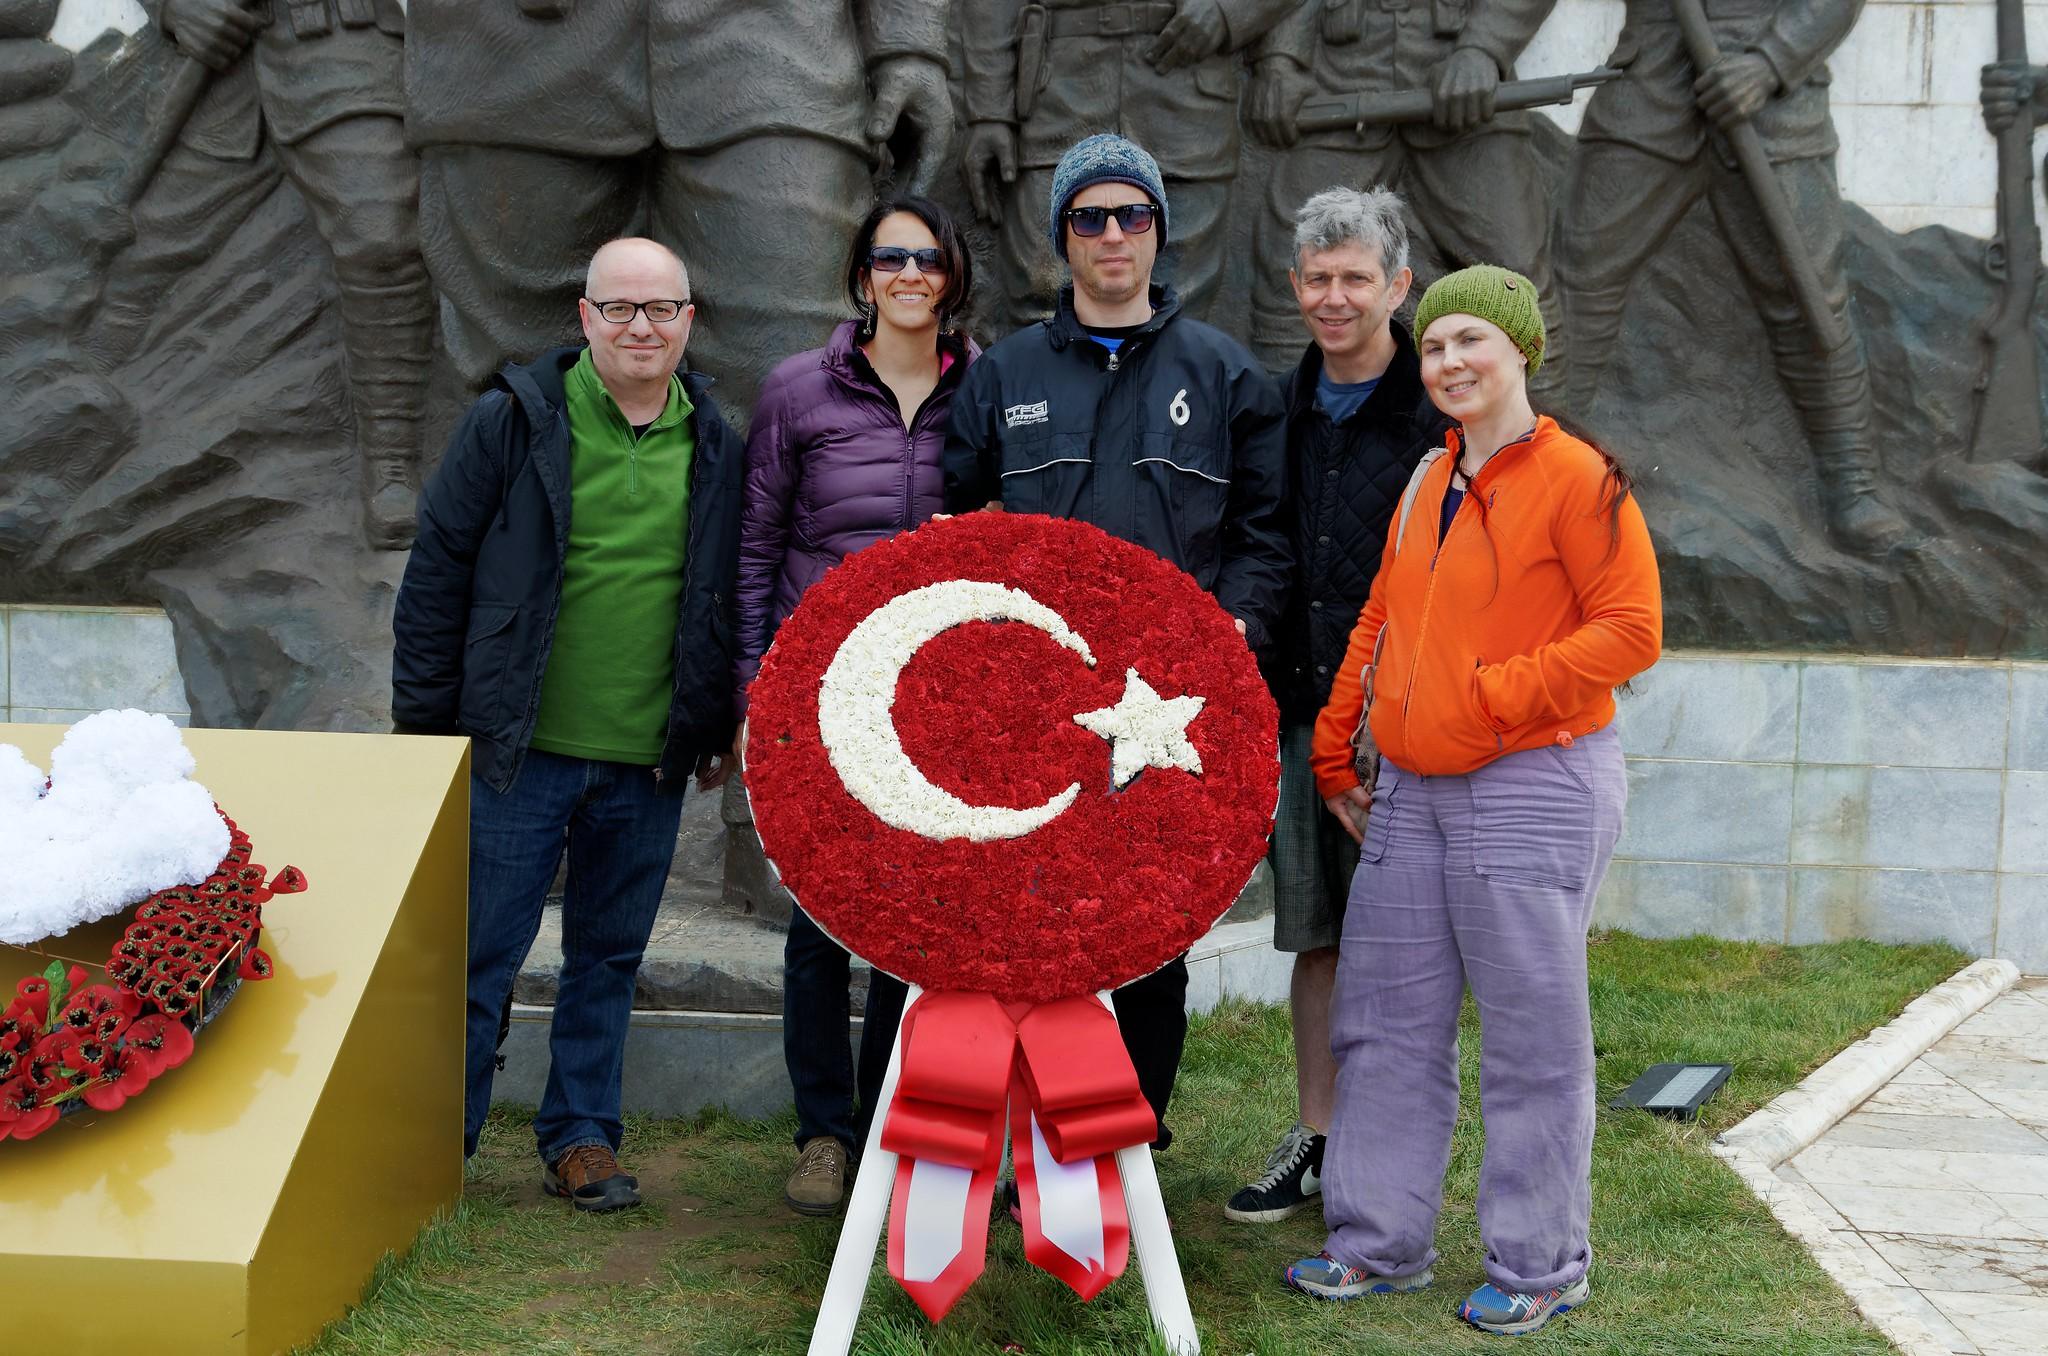 22-Turkey 25.04.2015 08-26-44 25.04.2015 11-21-29.2015 11-21-29